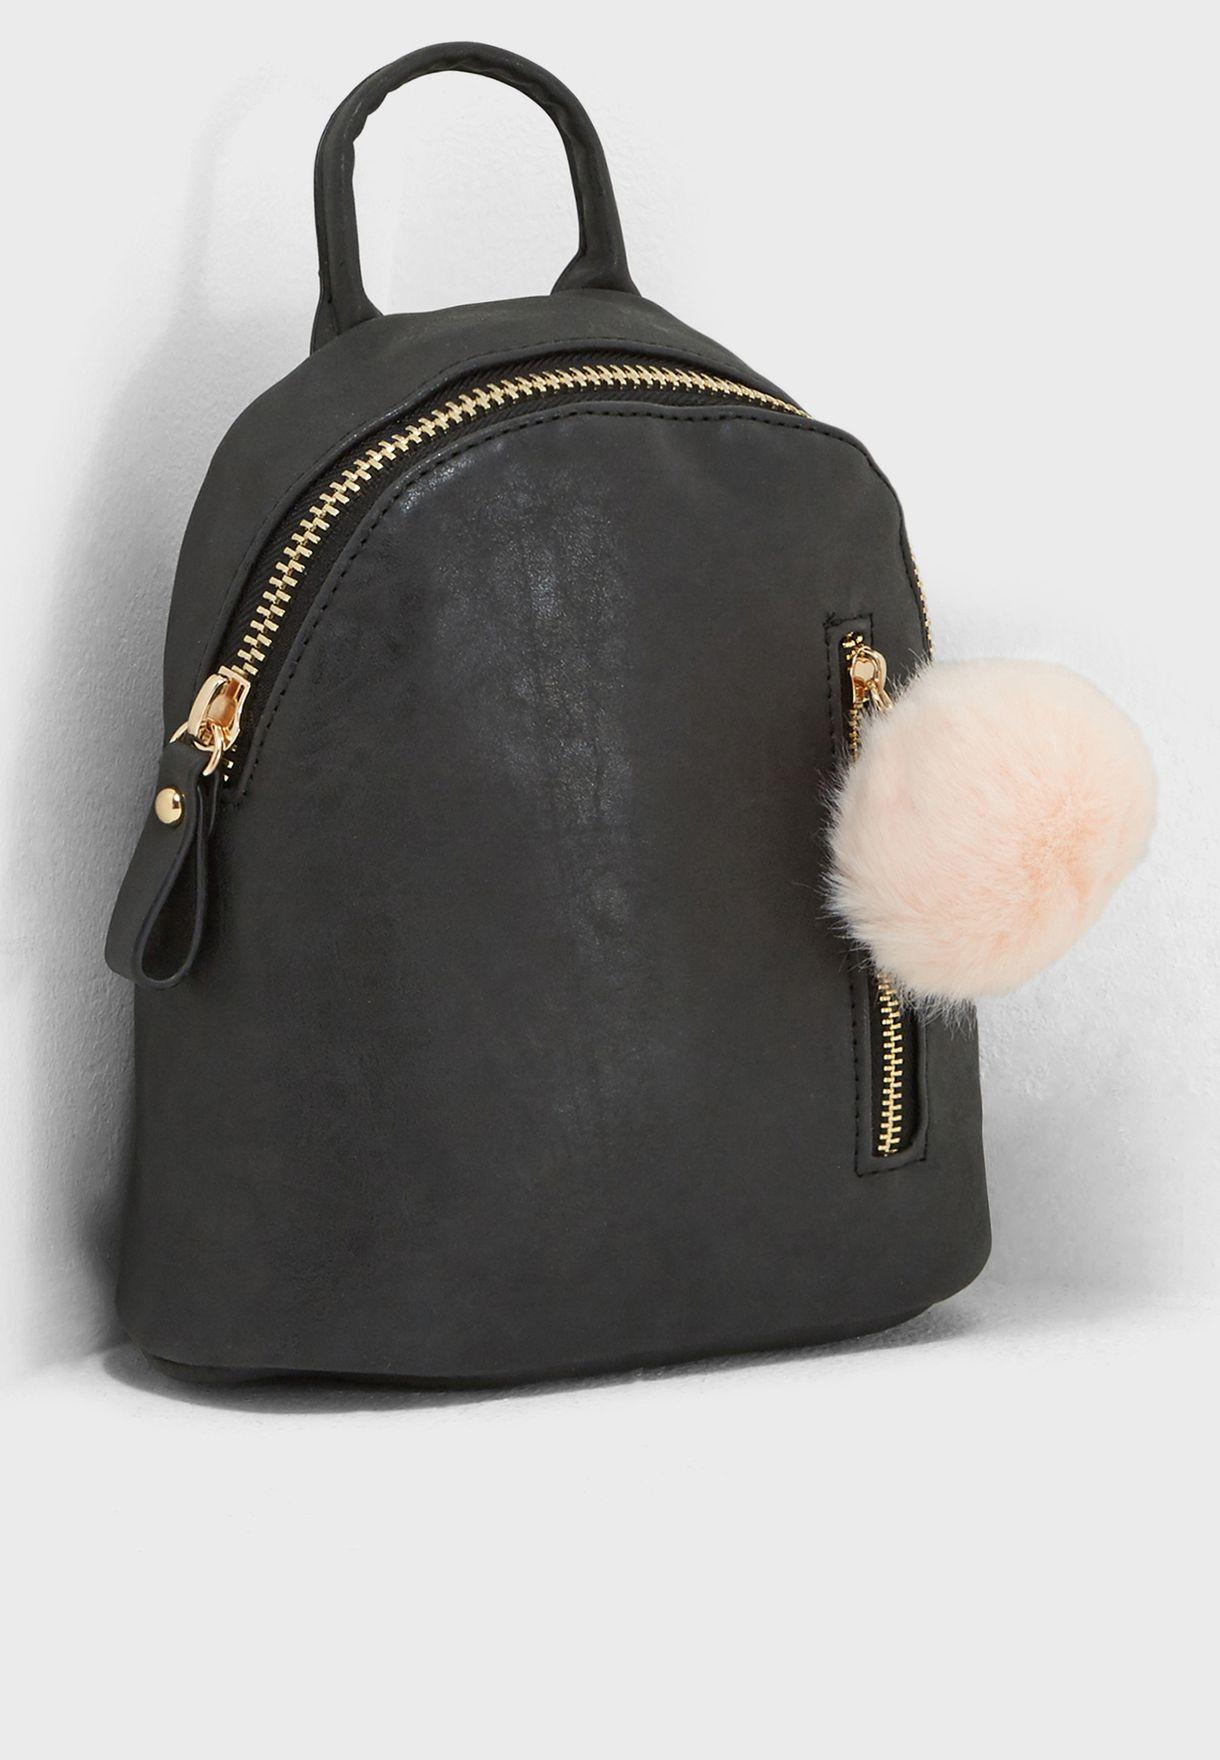 8e0acee98d Shop Typo black Santa Fe Pom Pom Backpack 141325-00 for Women in UAE ...